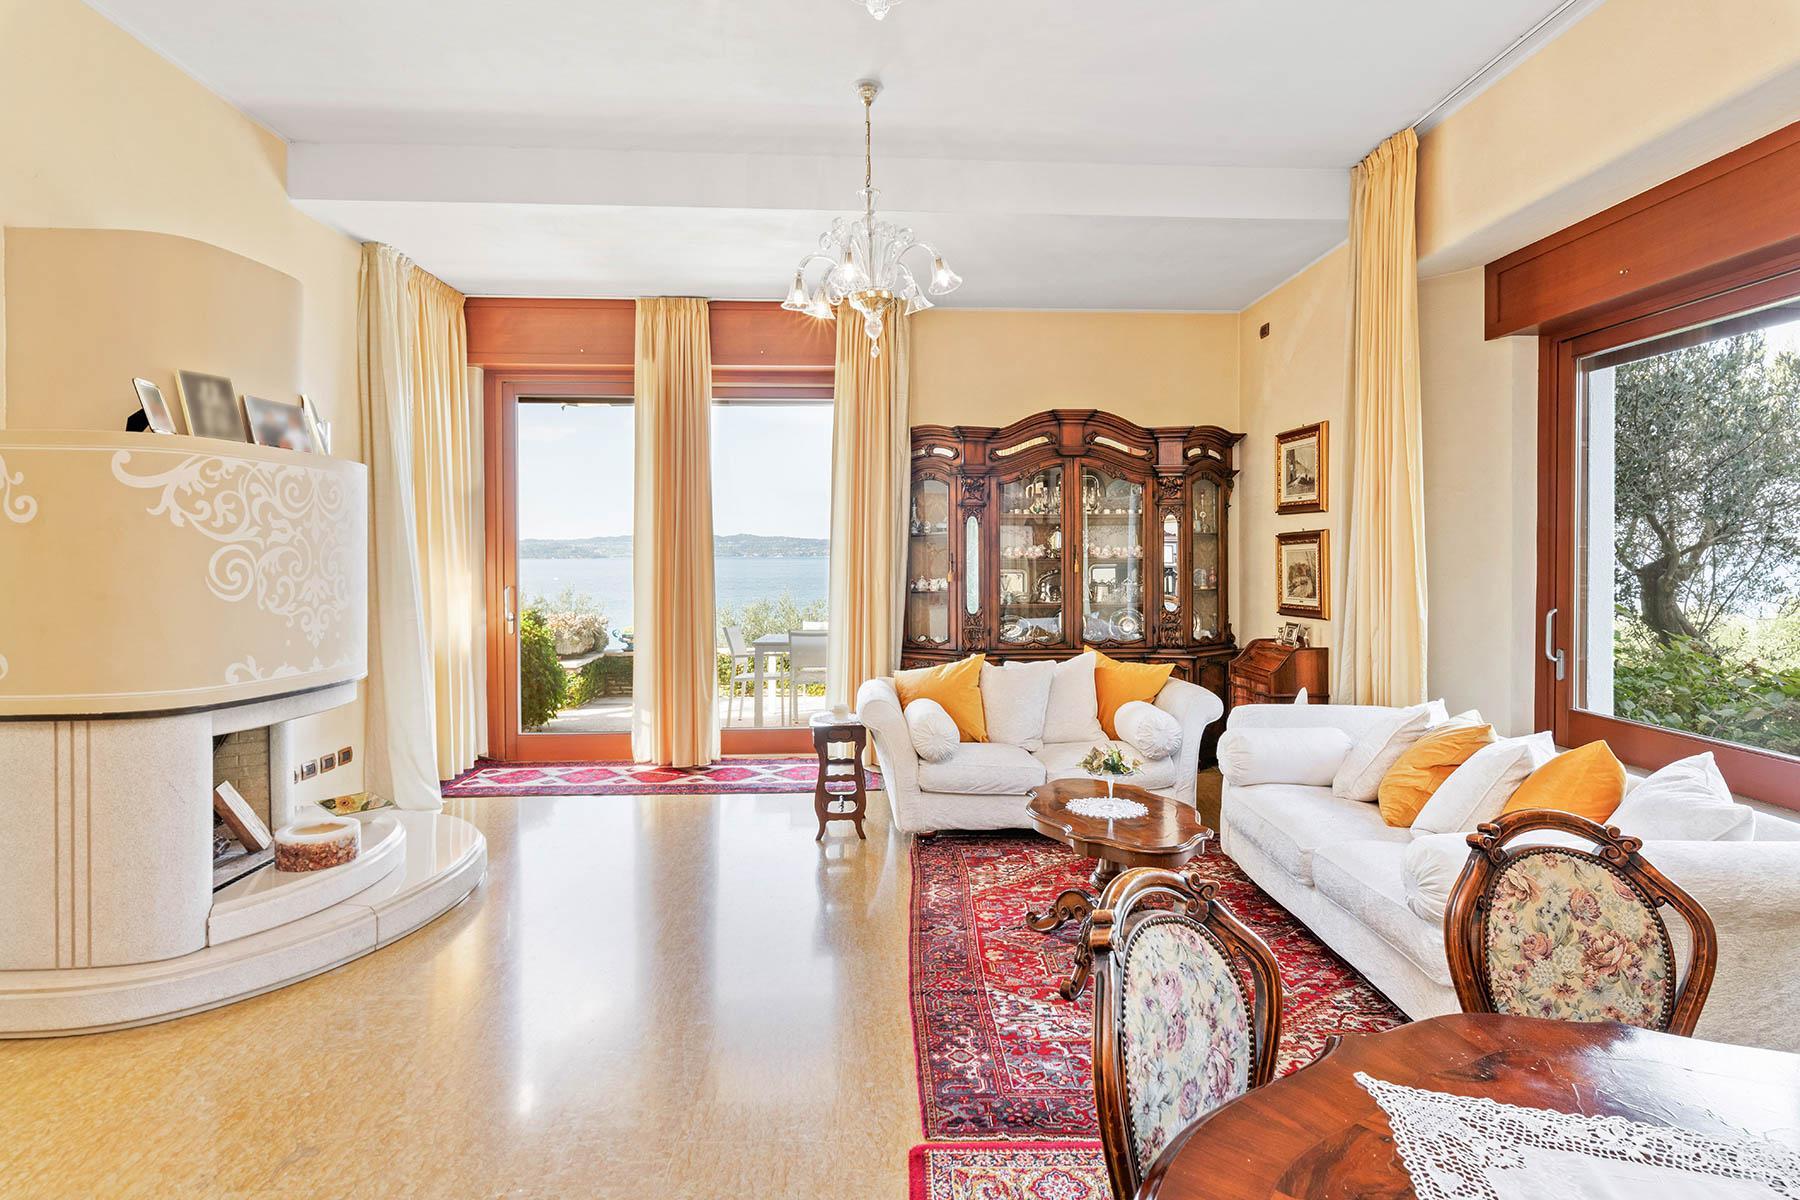 Villa in Vendita a Sirmione: 5 locali, 500 mq - Foto 11